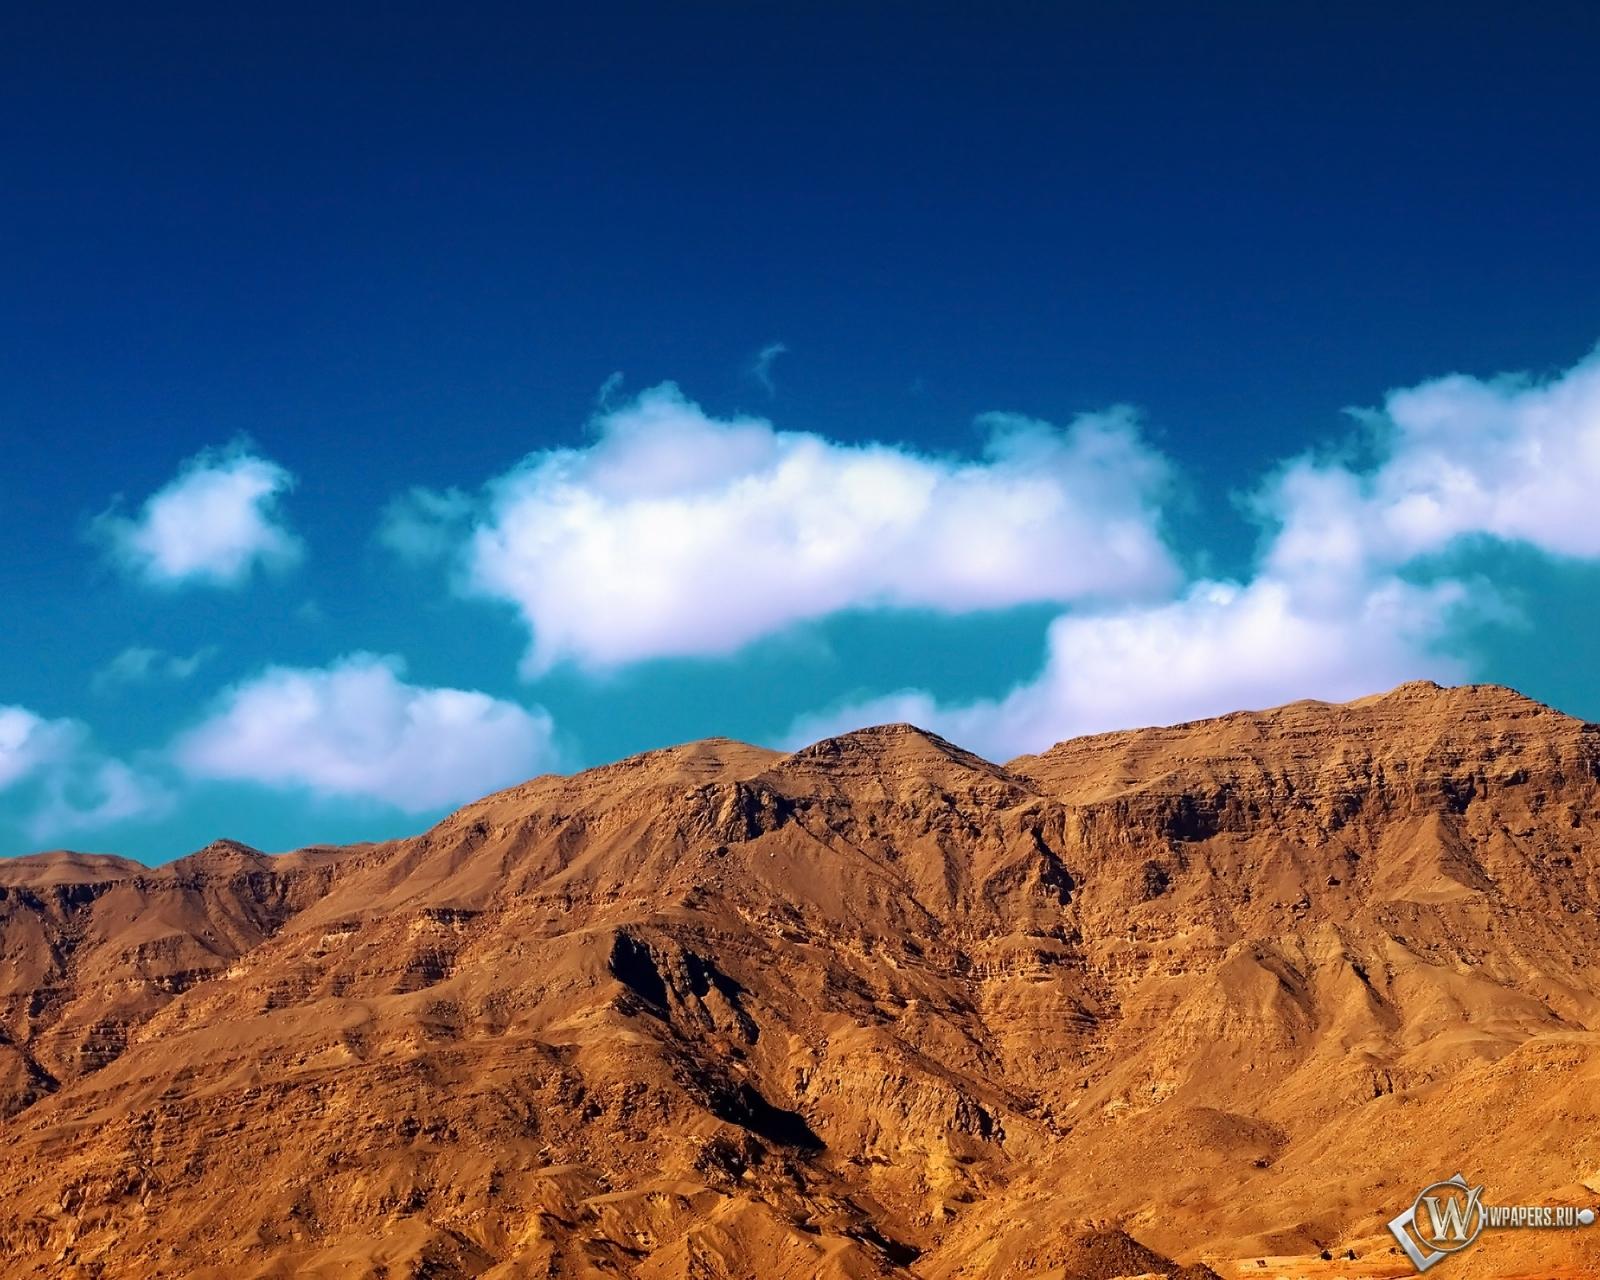 Ataqa mountain 1600x1280